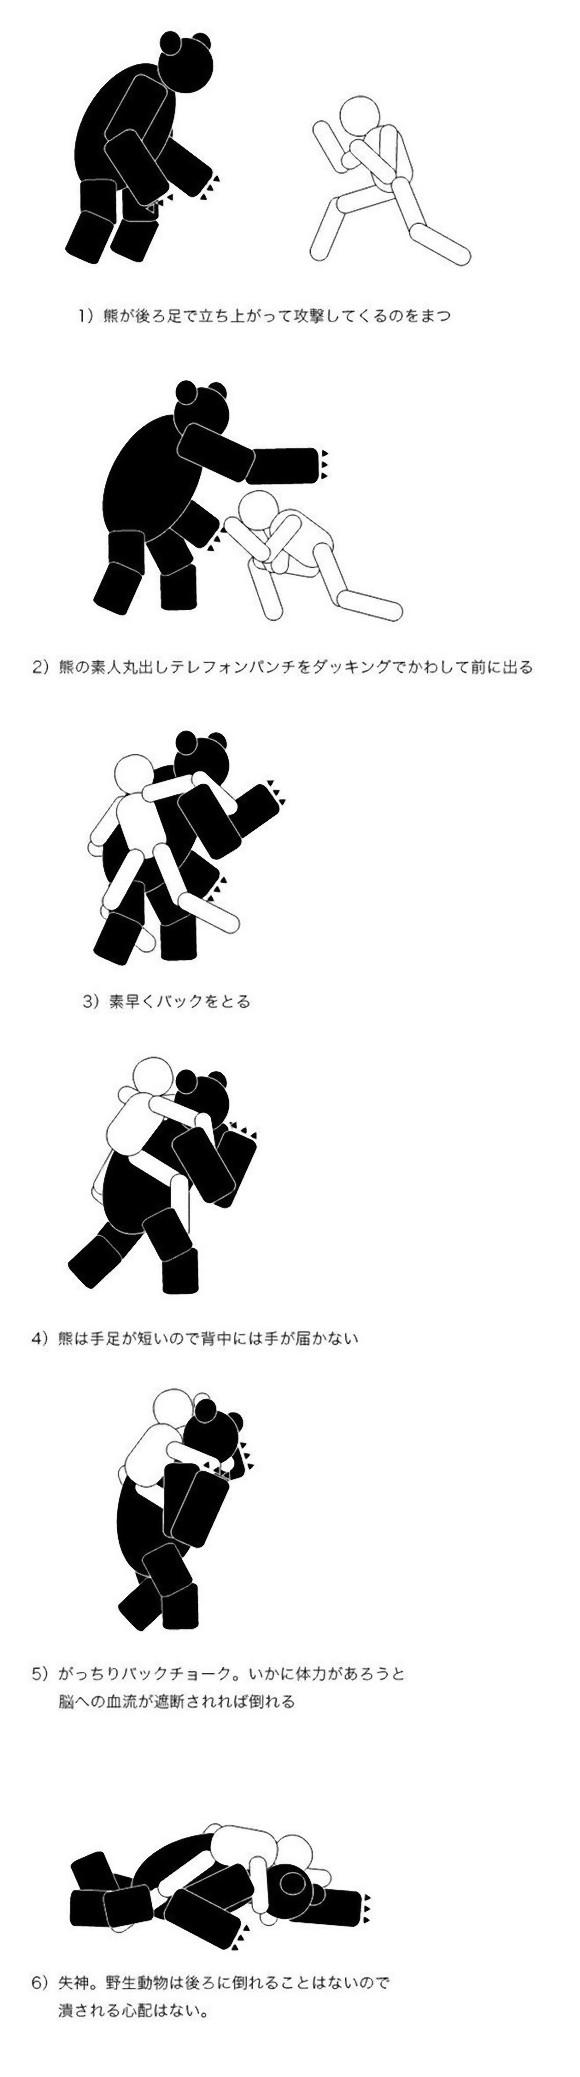 https://i1.wp.com/livedoor.blogimg.jp/karapaia_zaeega/imgs/e/7/e749da50.jpg